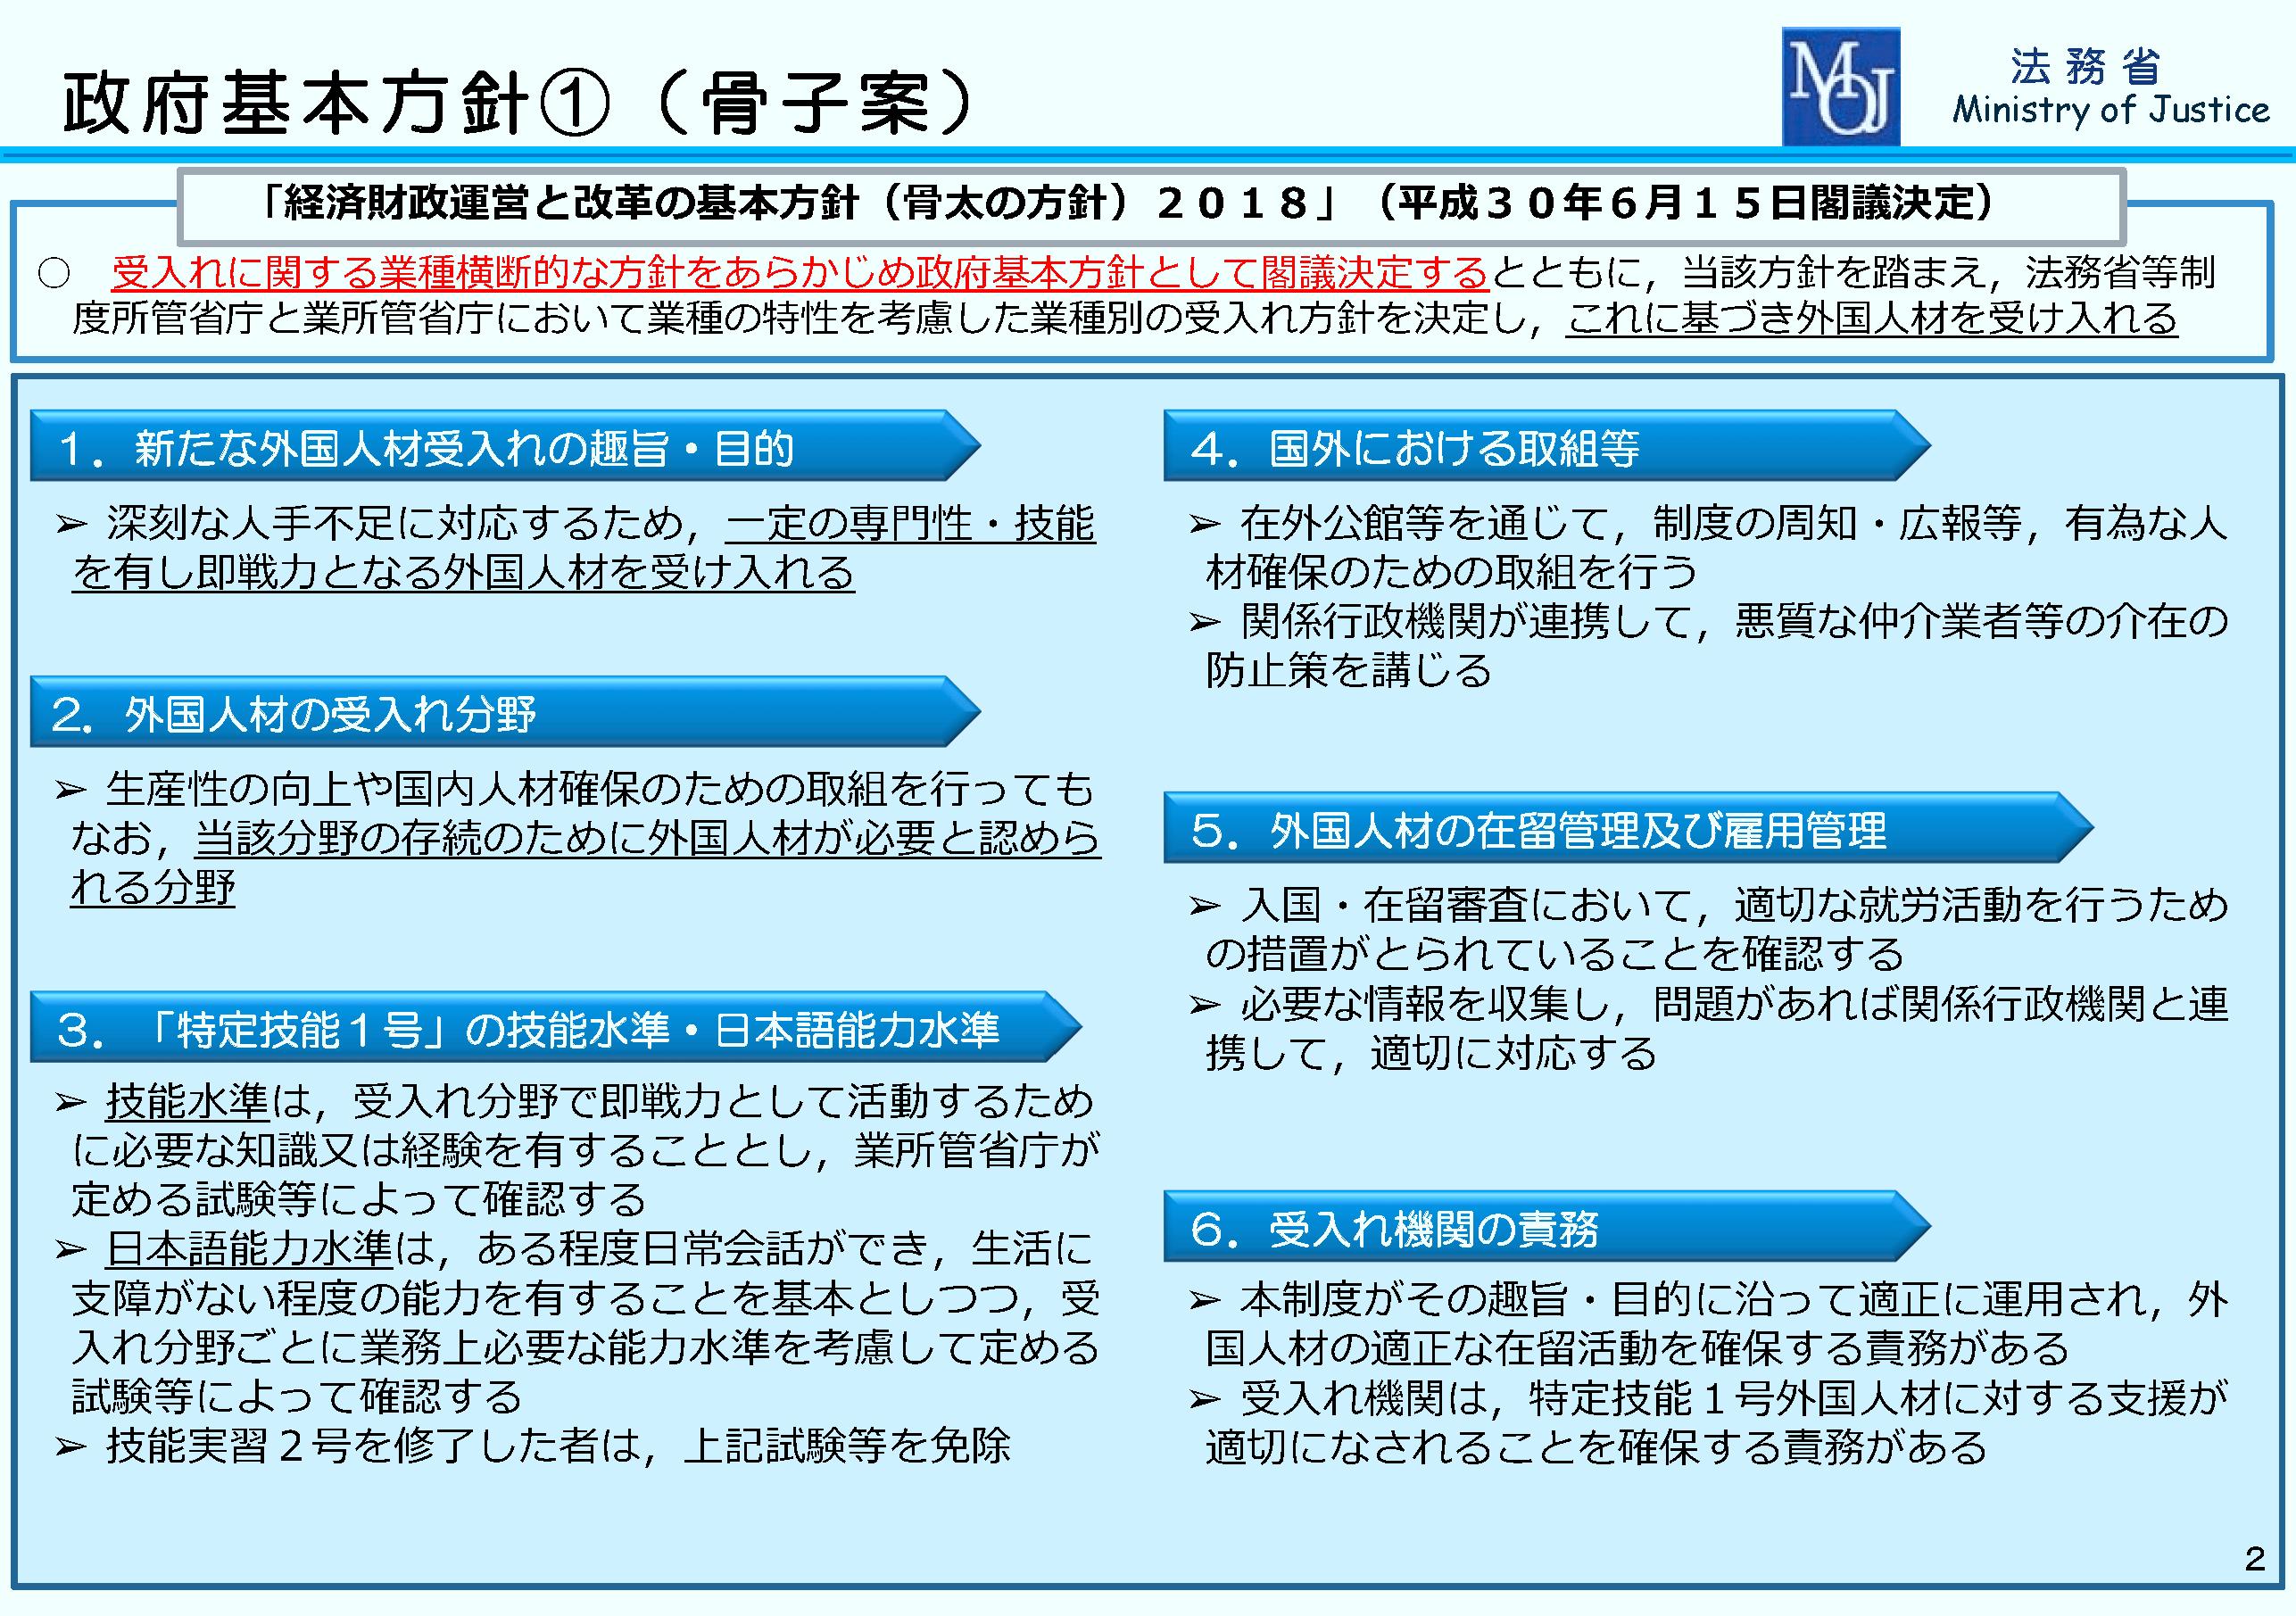 特定技能ビザ(在留資格)資料2-3